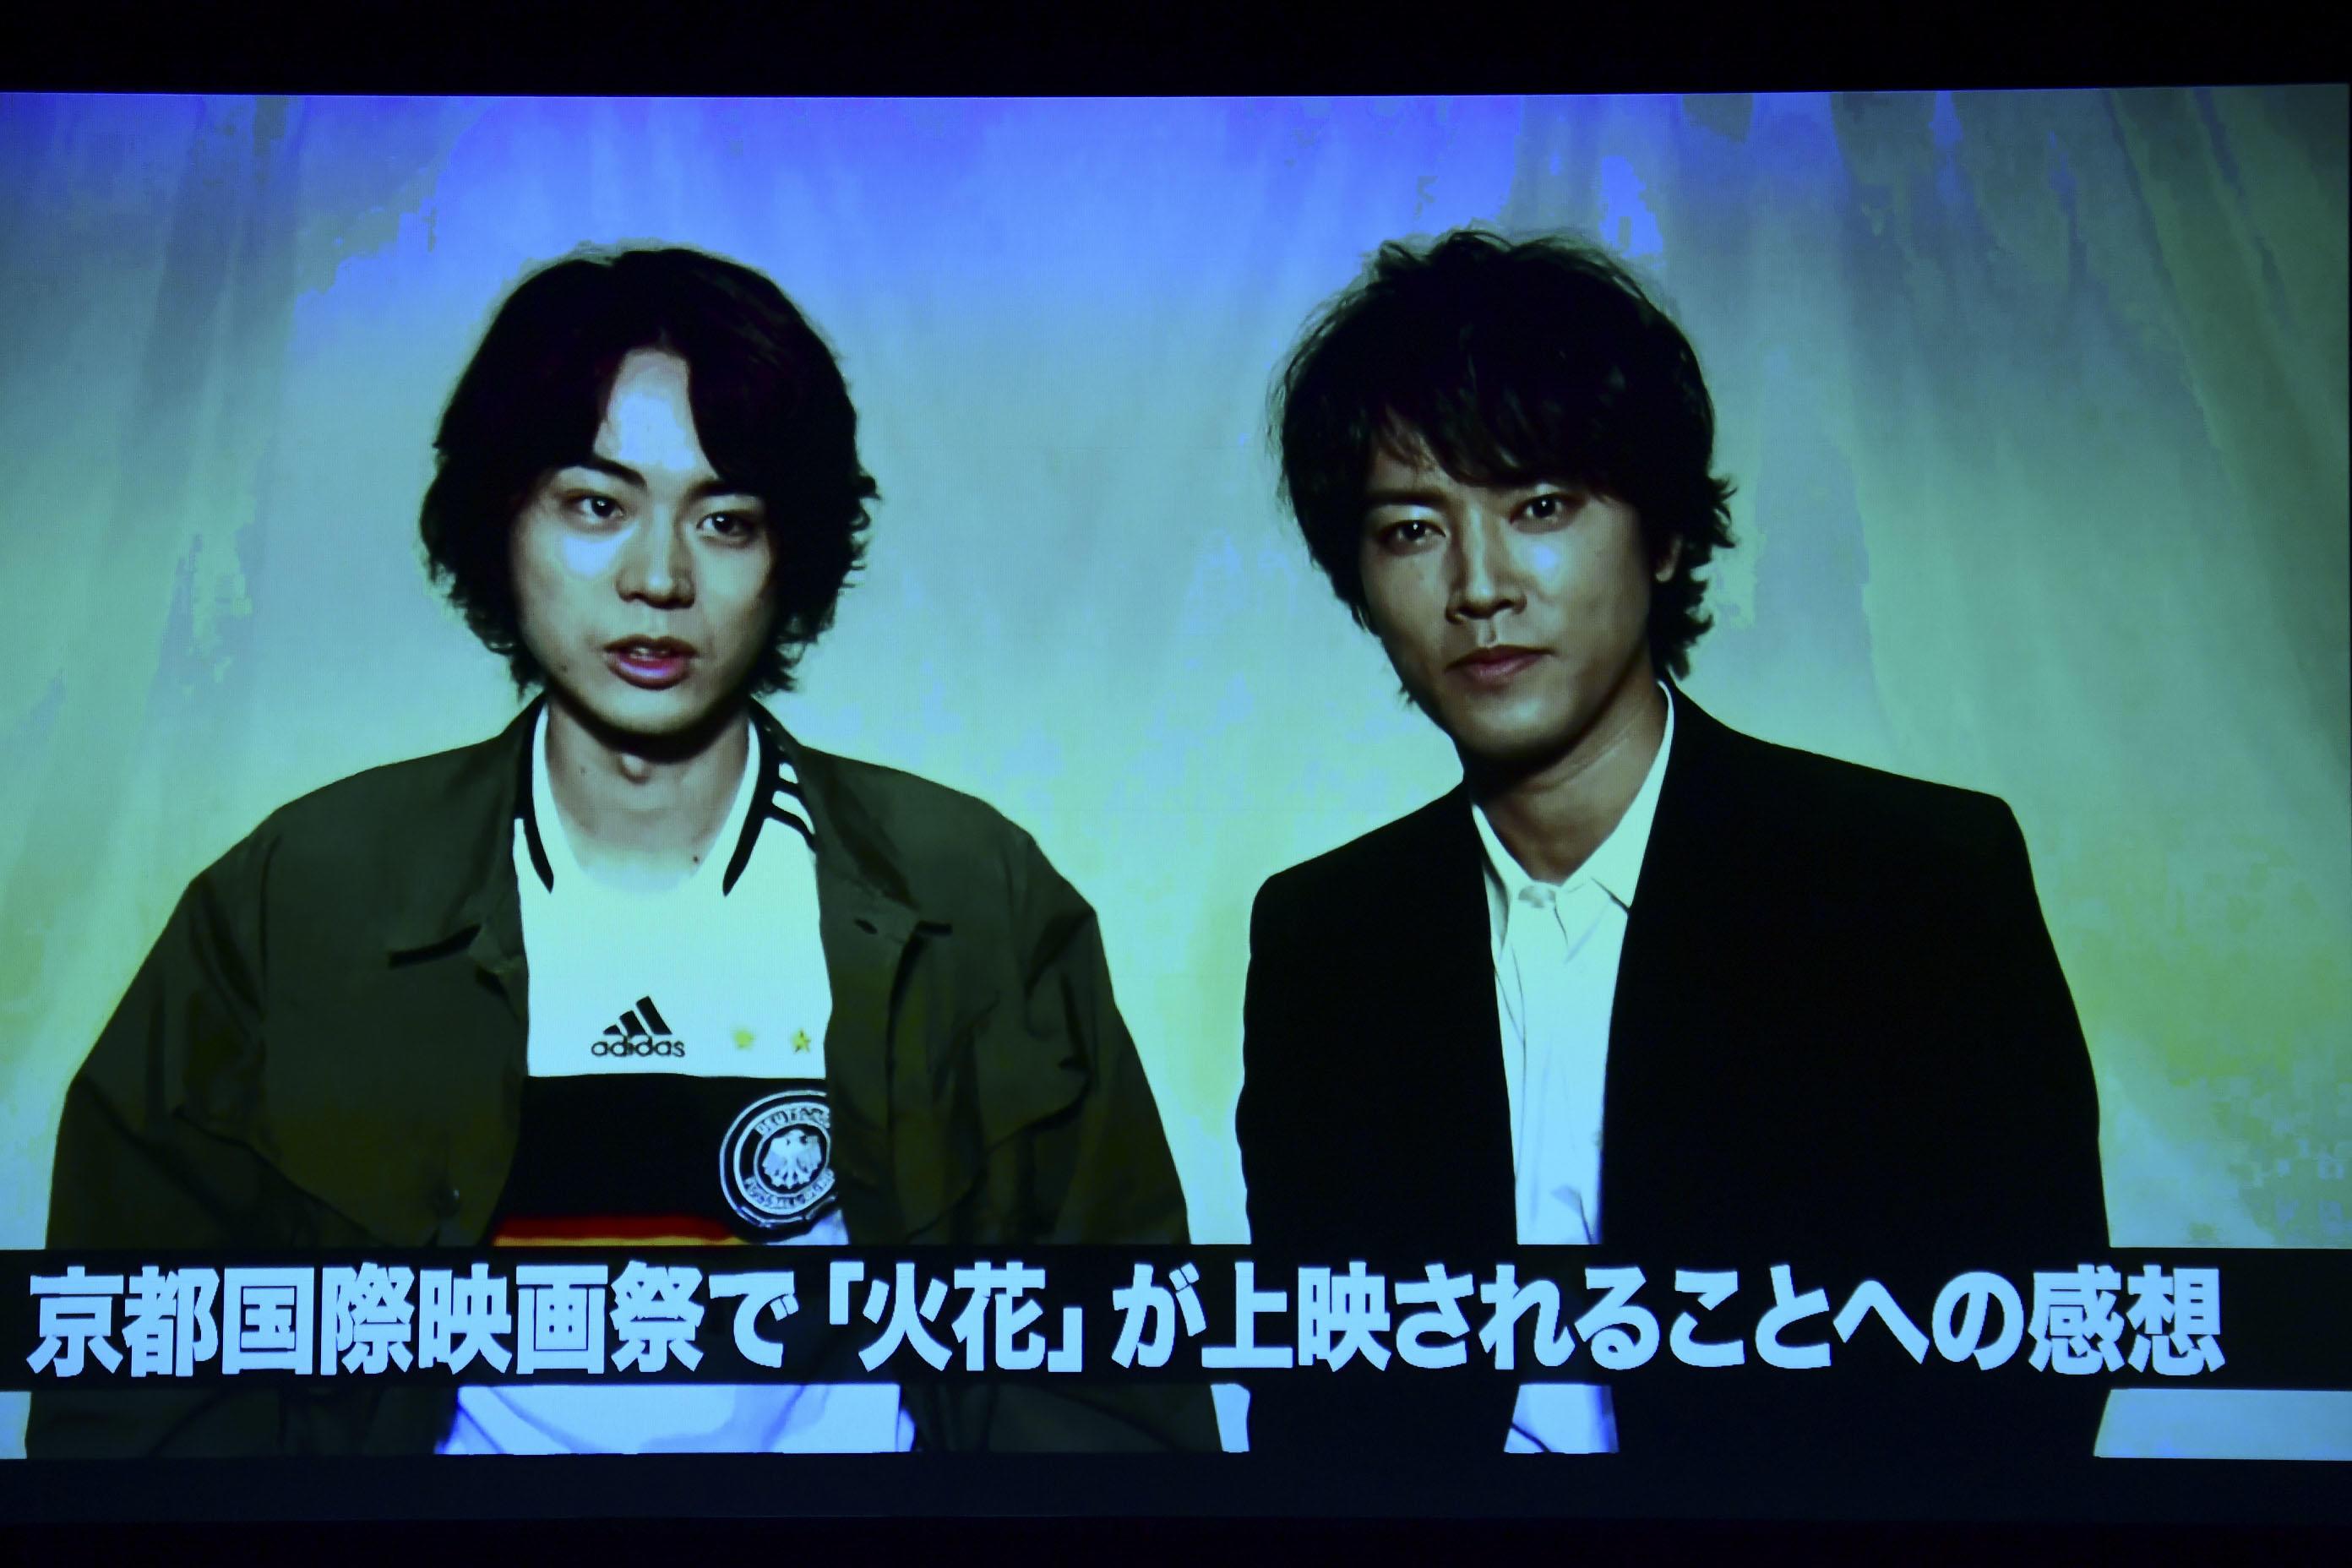 http://news.yoshimoto.co.jp/20170907004133-223ee4b1e21cceca8b73cc8e99470ebae3f8bd46.jpg